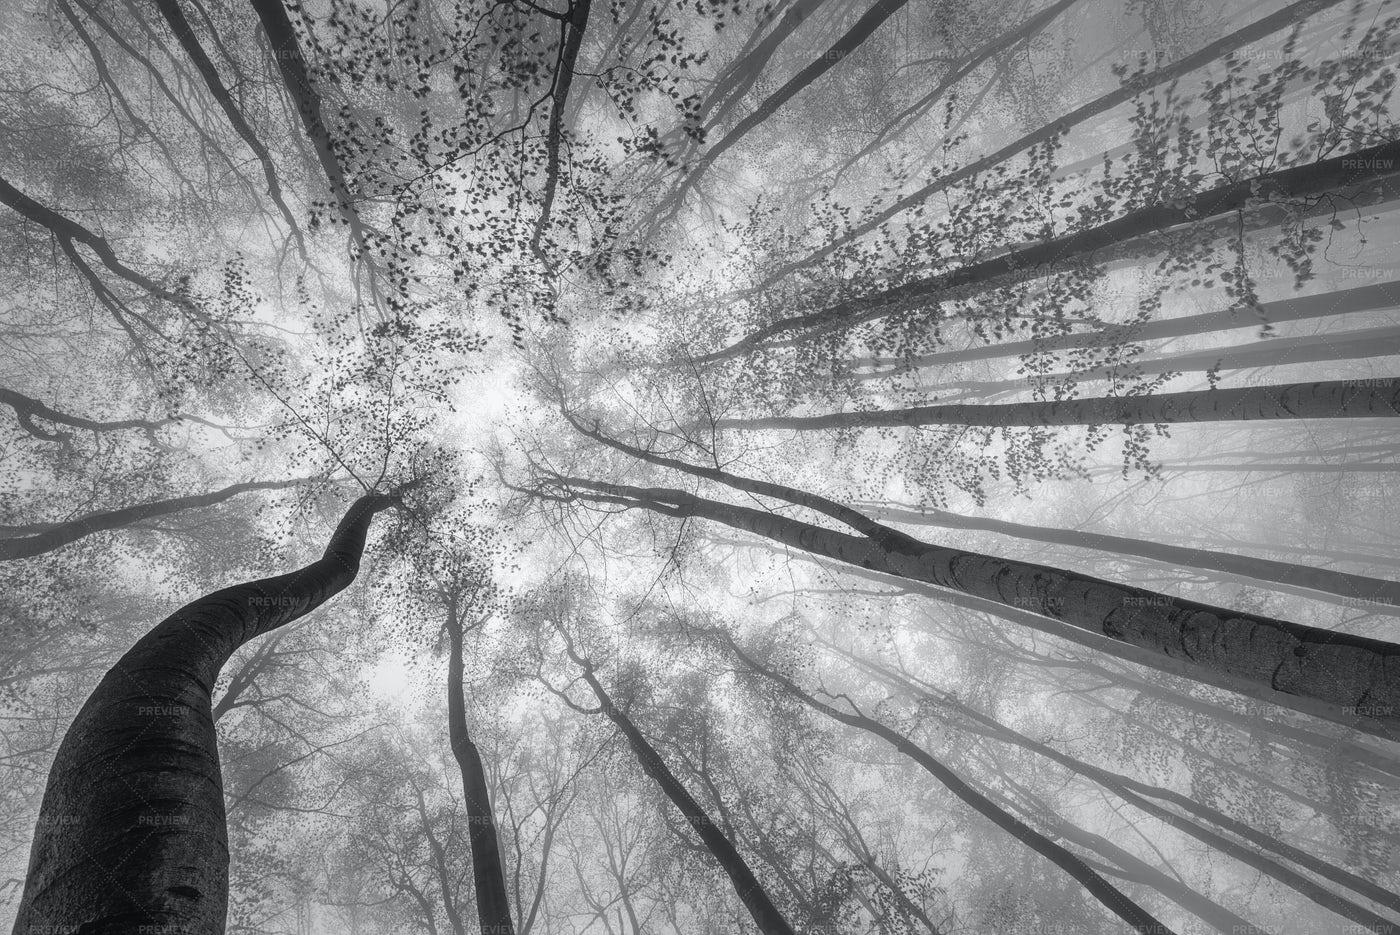 Springtime Trees Canopy: Stock Photos